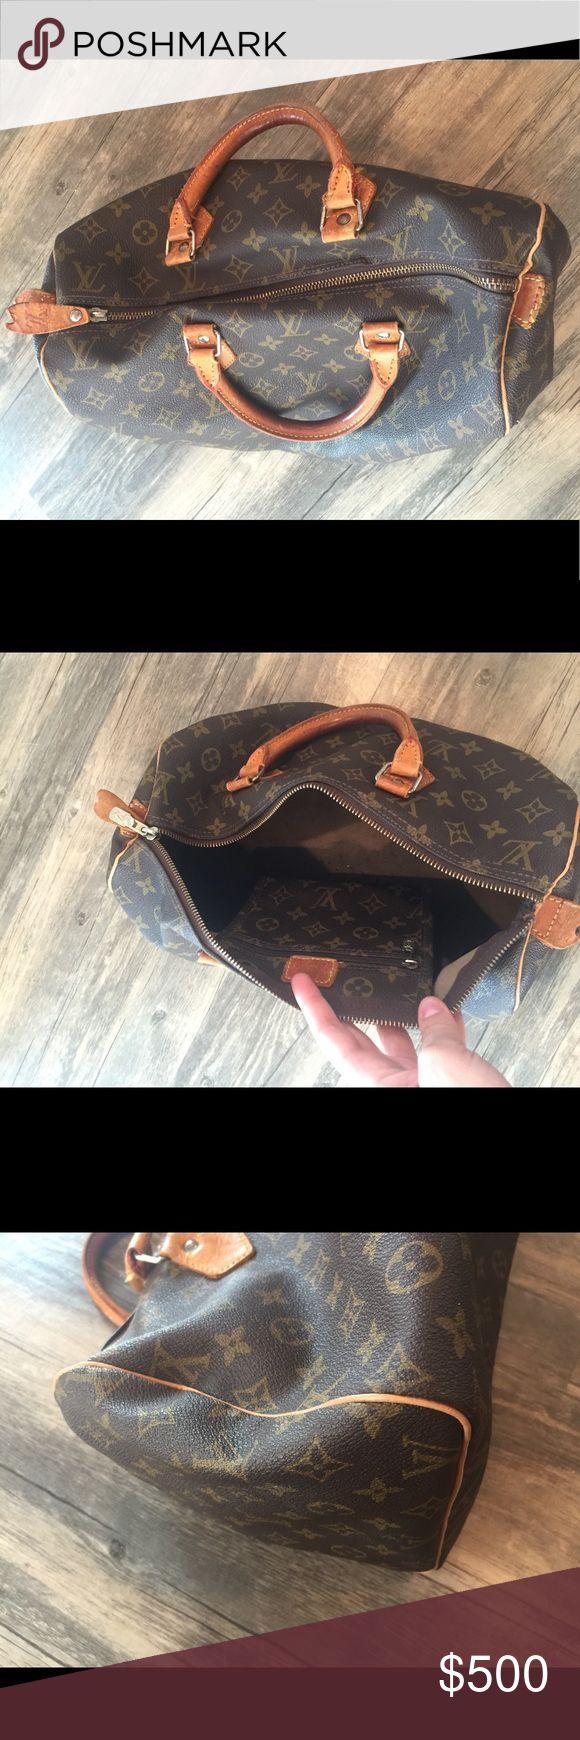 Louis Vuitton Speedy 40 duffle handbag Louis Vuitton Speedy 40 duffle handbag // preowned see pictures for wear Louis Vuitton Bags Satchels